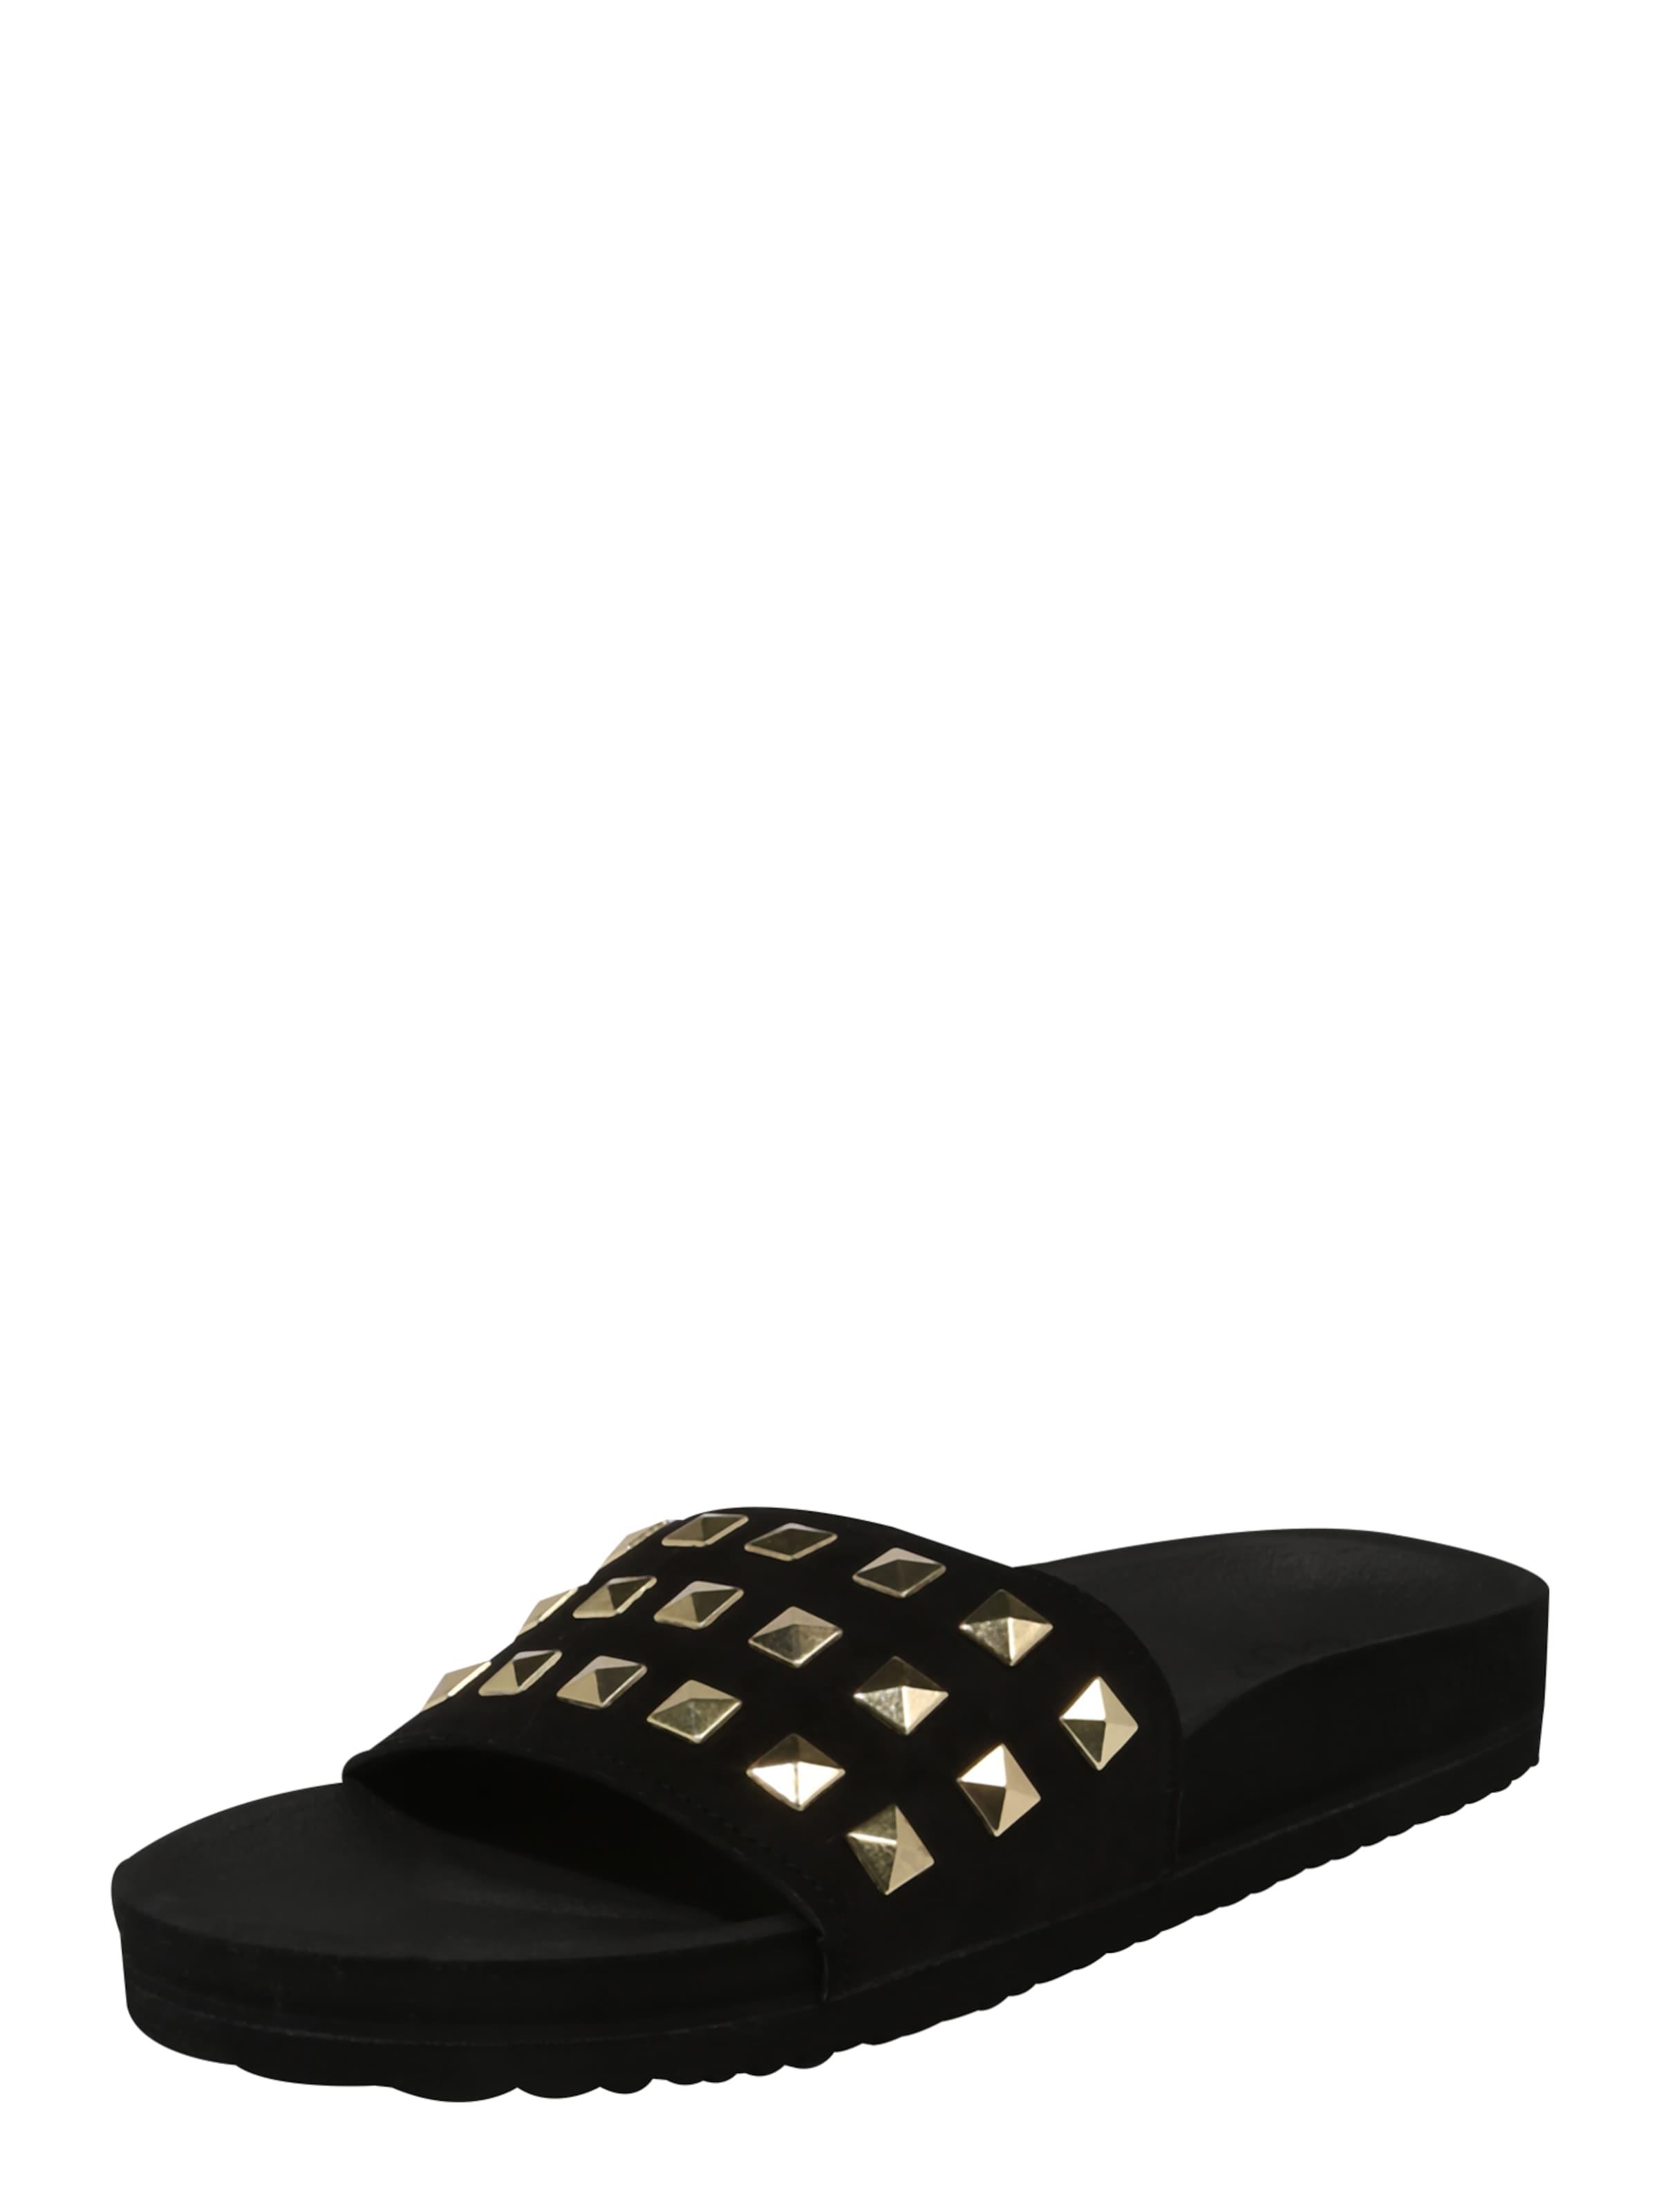 Haltbare Mode billige Schuhe FLIP*FLOP | Pantolette 'Pool Rivet' Schuhe Gut getragene Schuhe